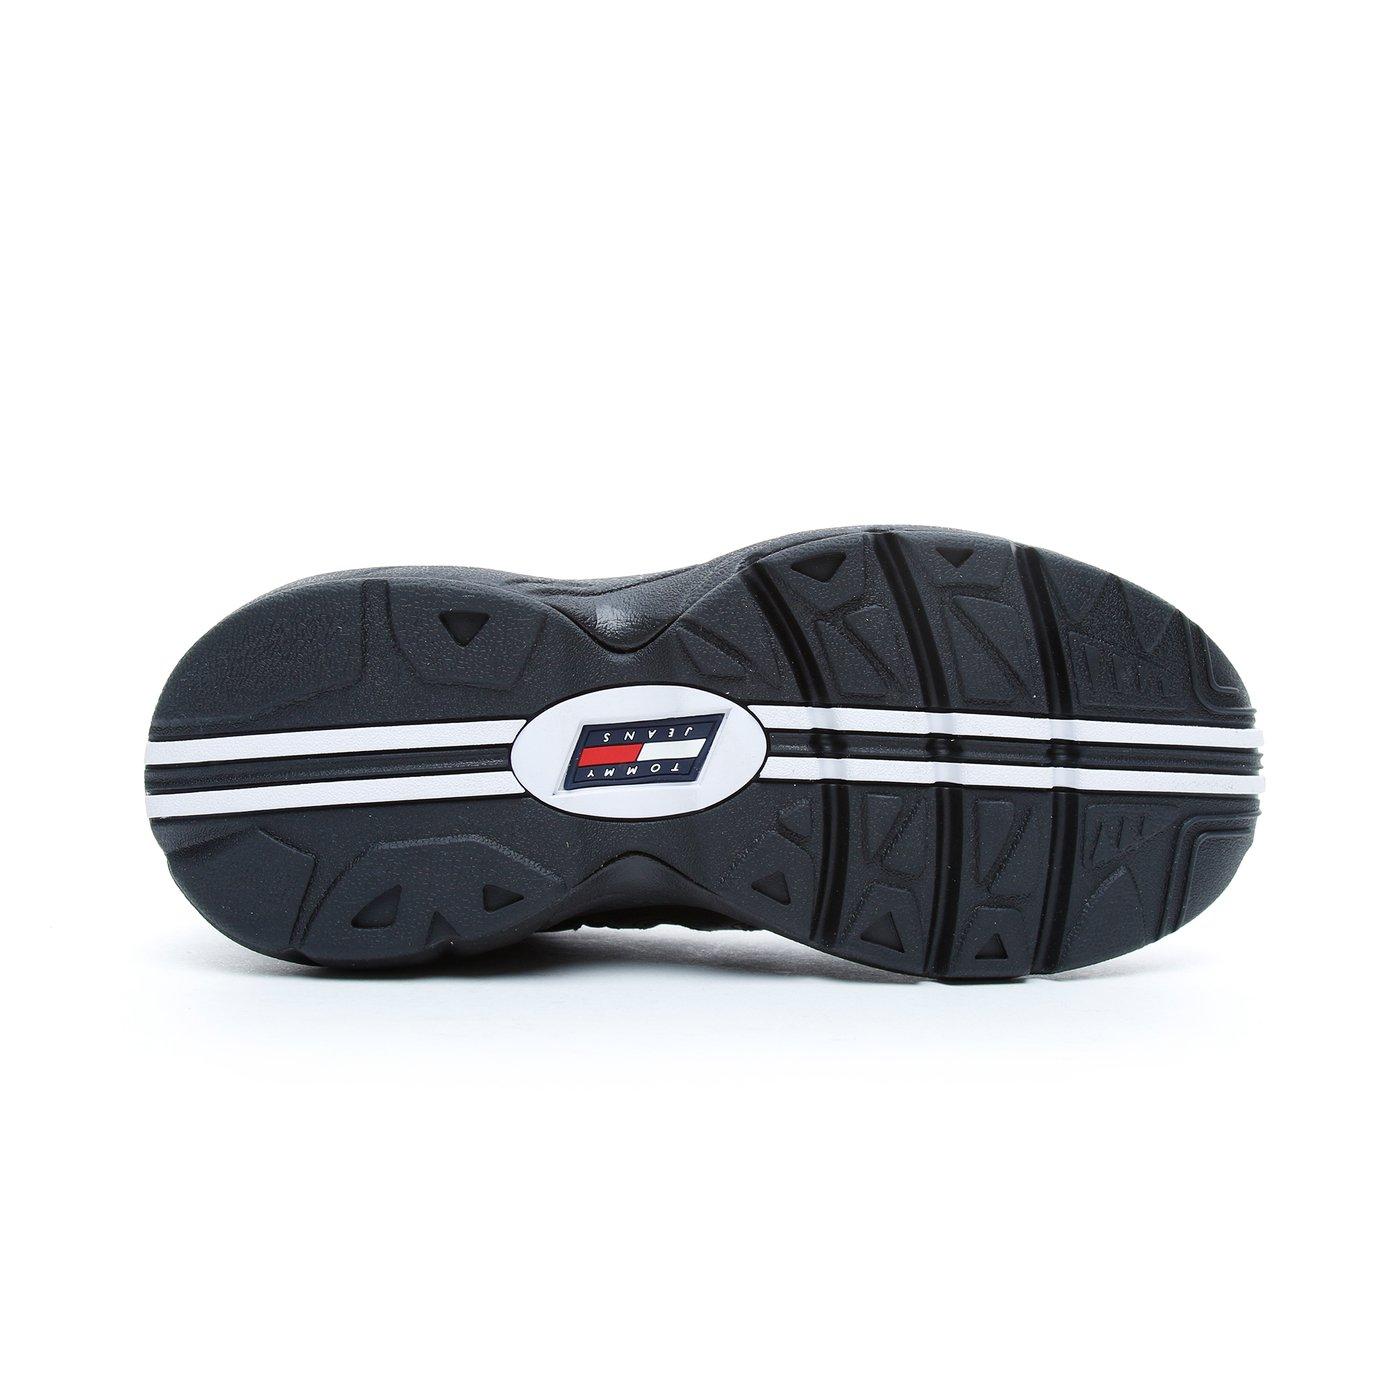 Tommy Hilfiger Retro Kadın Siyah Spor Ayakkabı